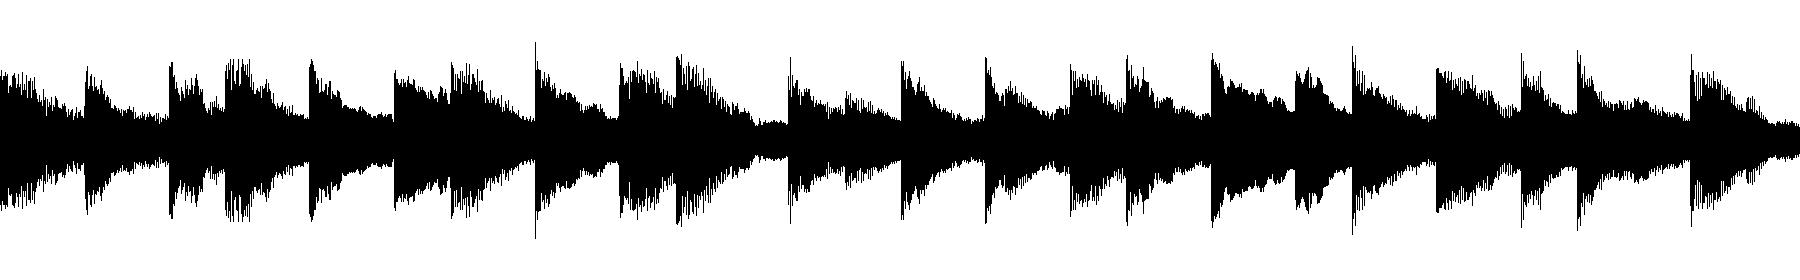 jazzy chords 110bpm c